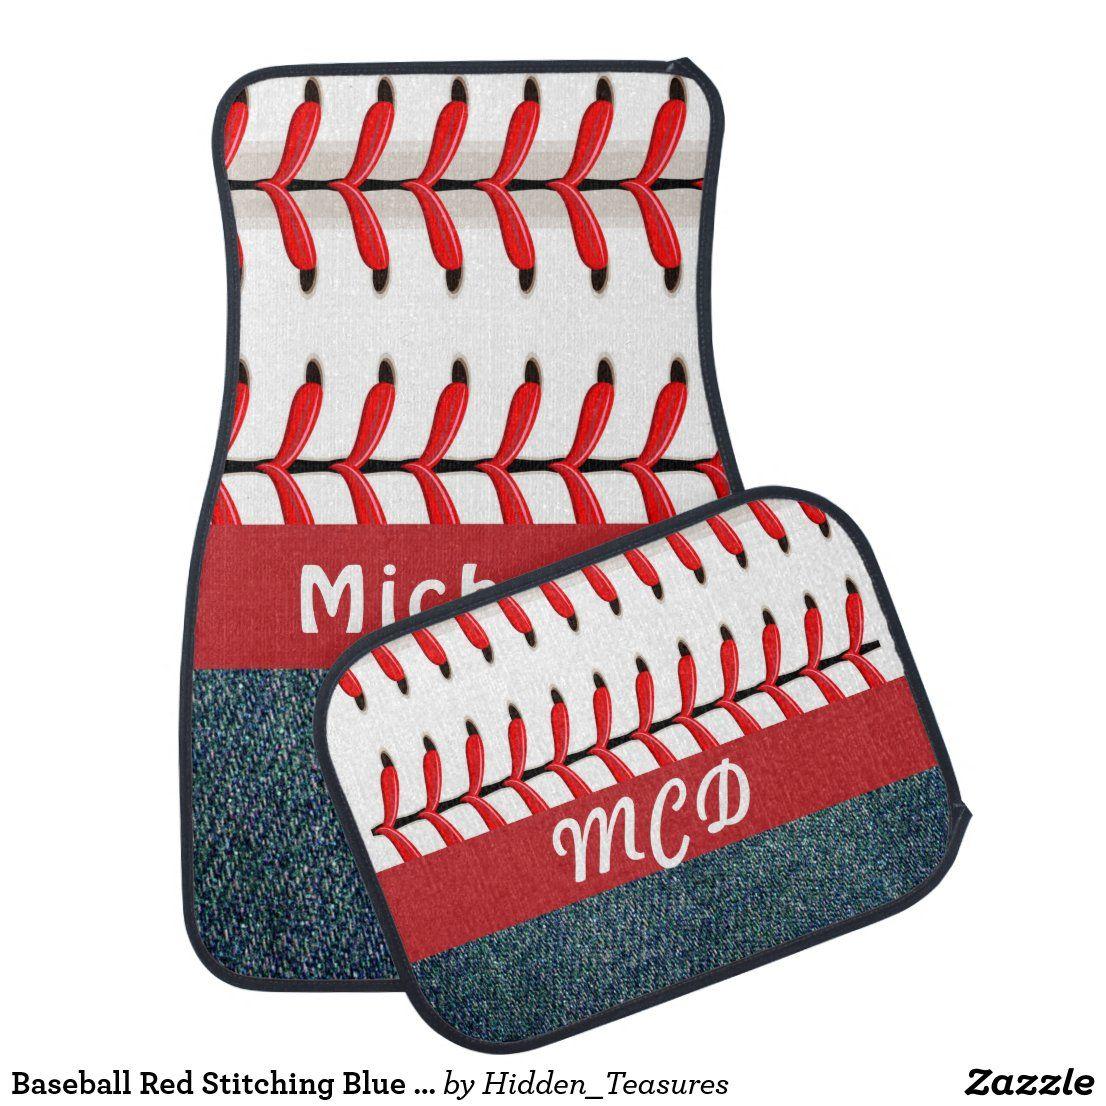 Baseball Red Stitching Blue Denim Editable Car Floor Mat Zazzle Com In 2020 Blue Denim Car Floor Mats Baseball Stitch